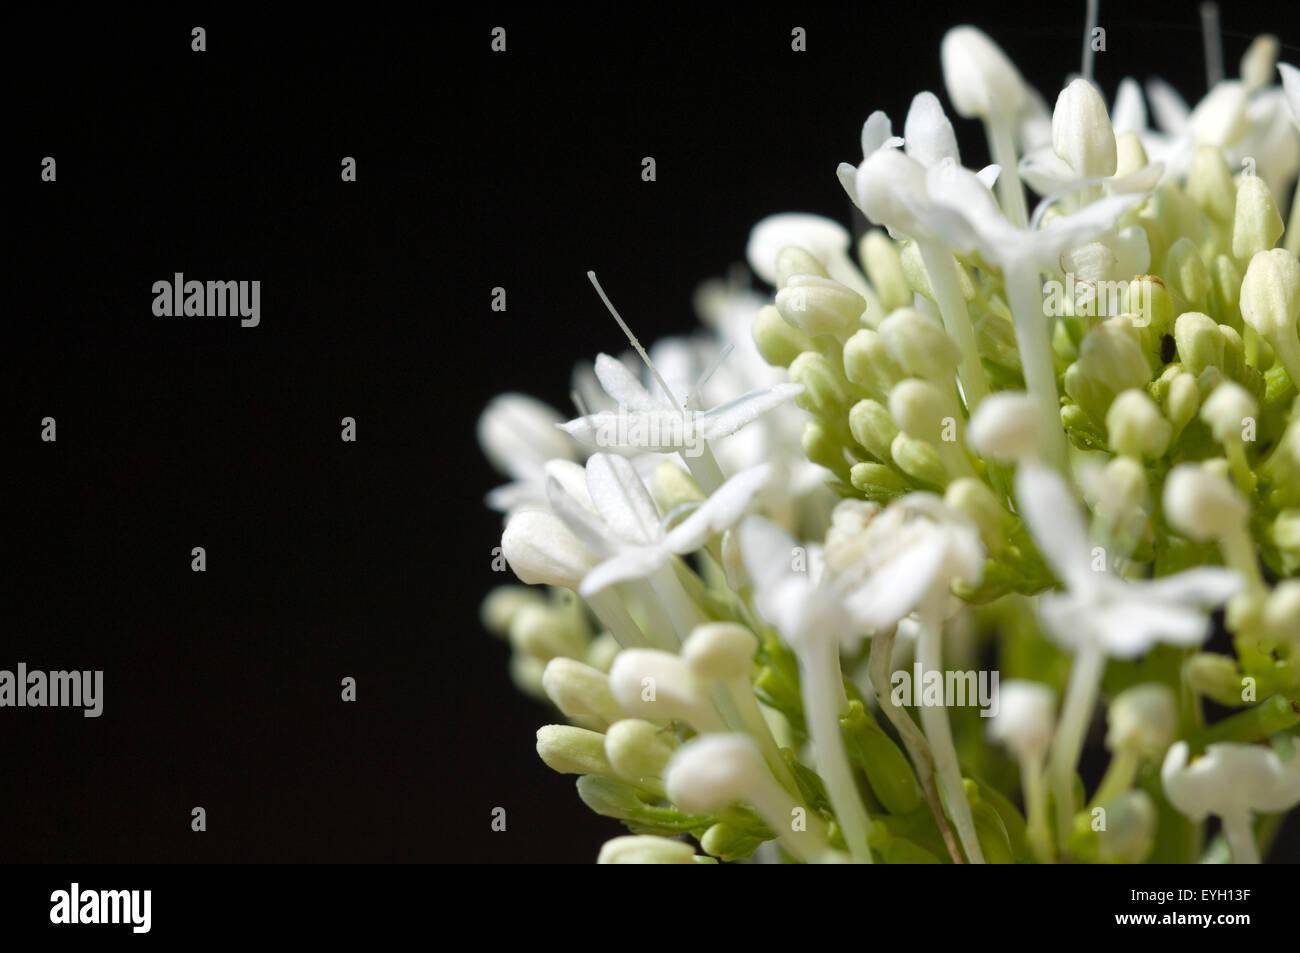 Spornblume, Centranthus, ruber, alba, Albus, - Stock Image